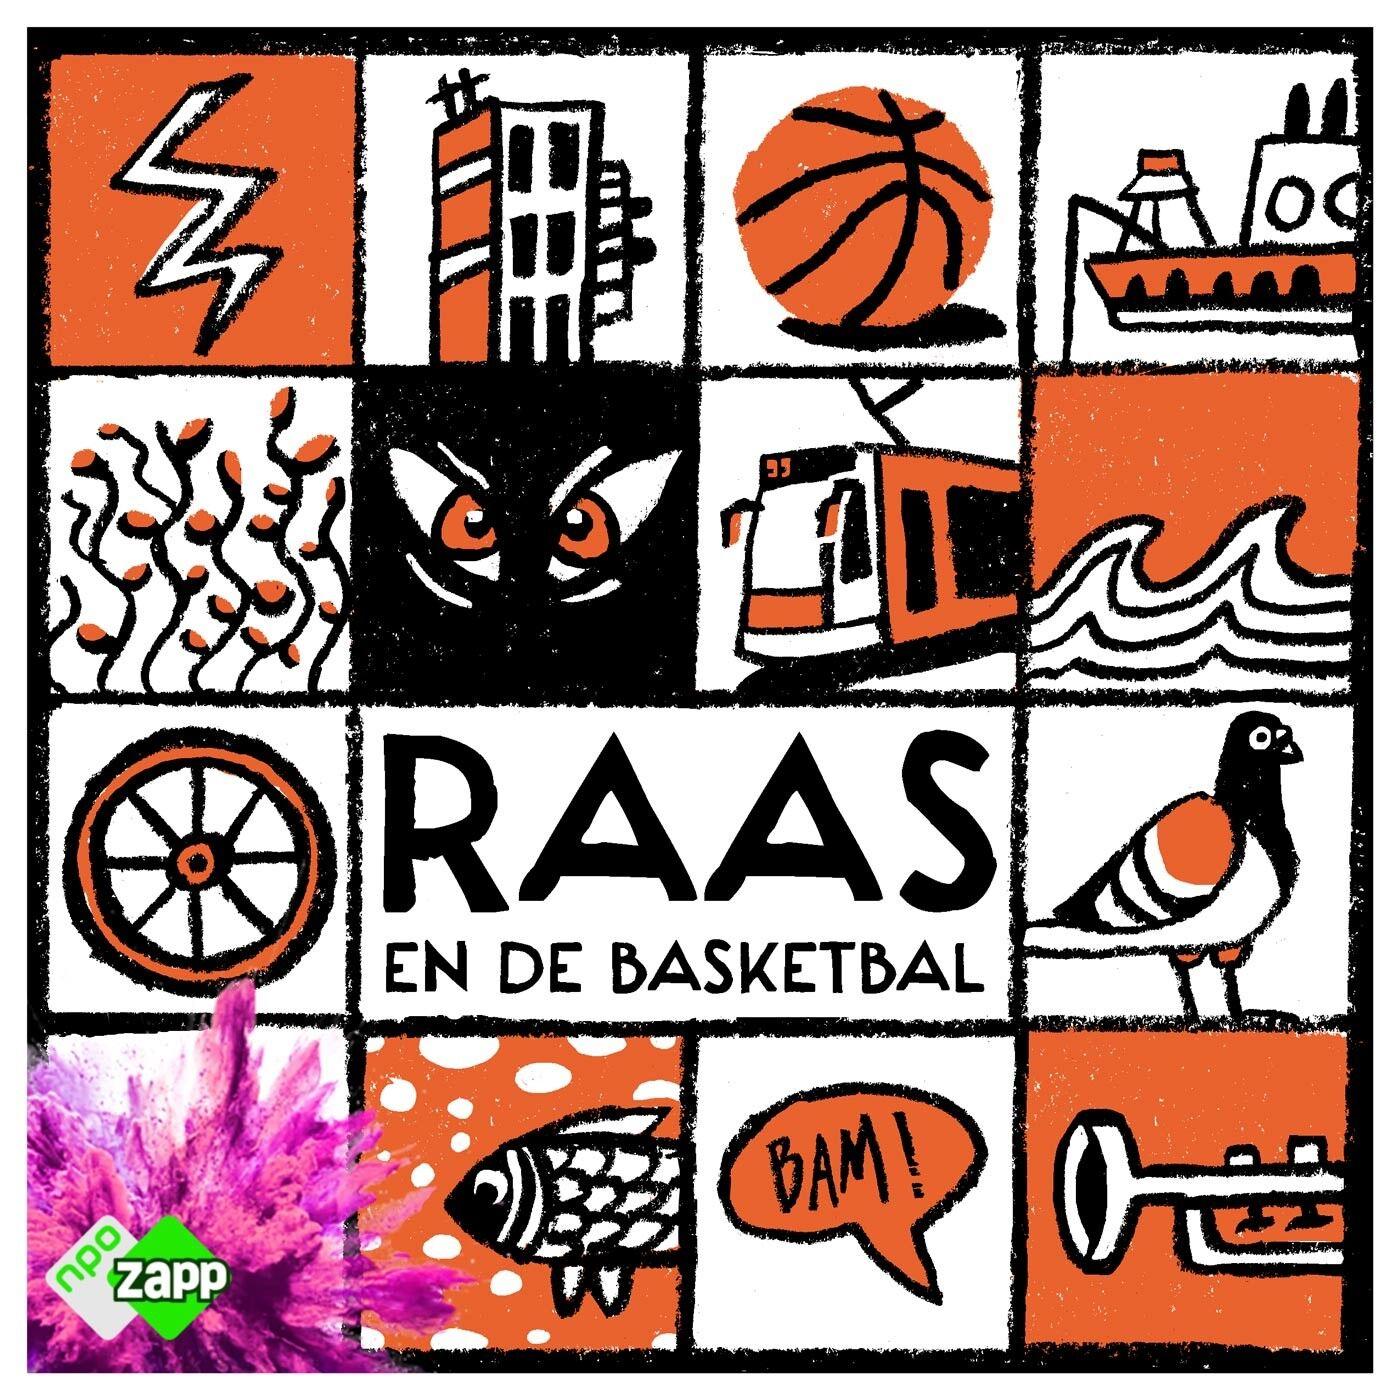 Raas en de basketbal logo